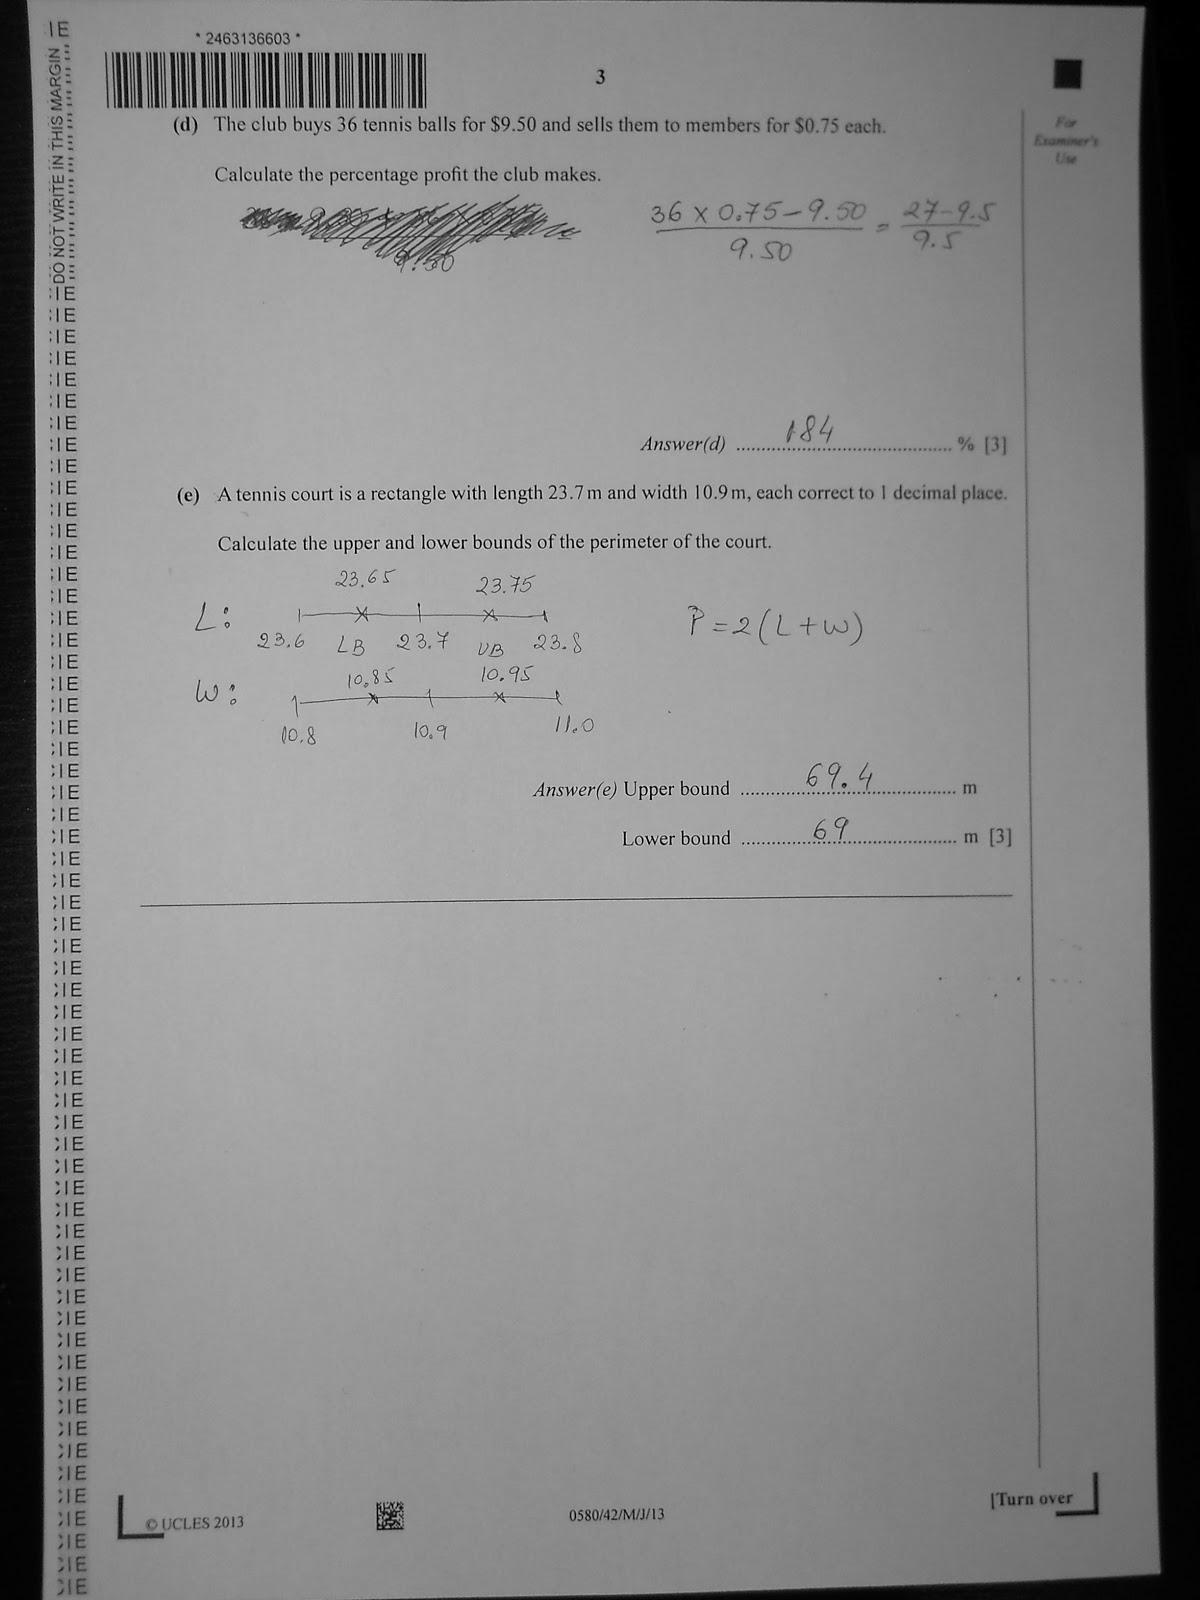 Igcse mathematics past papers 2011 Essay Sample - August 2019 - 1271